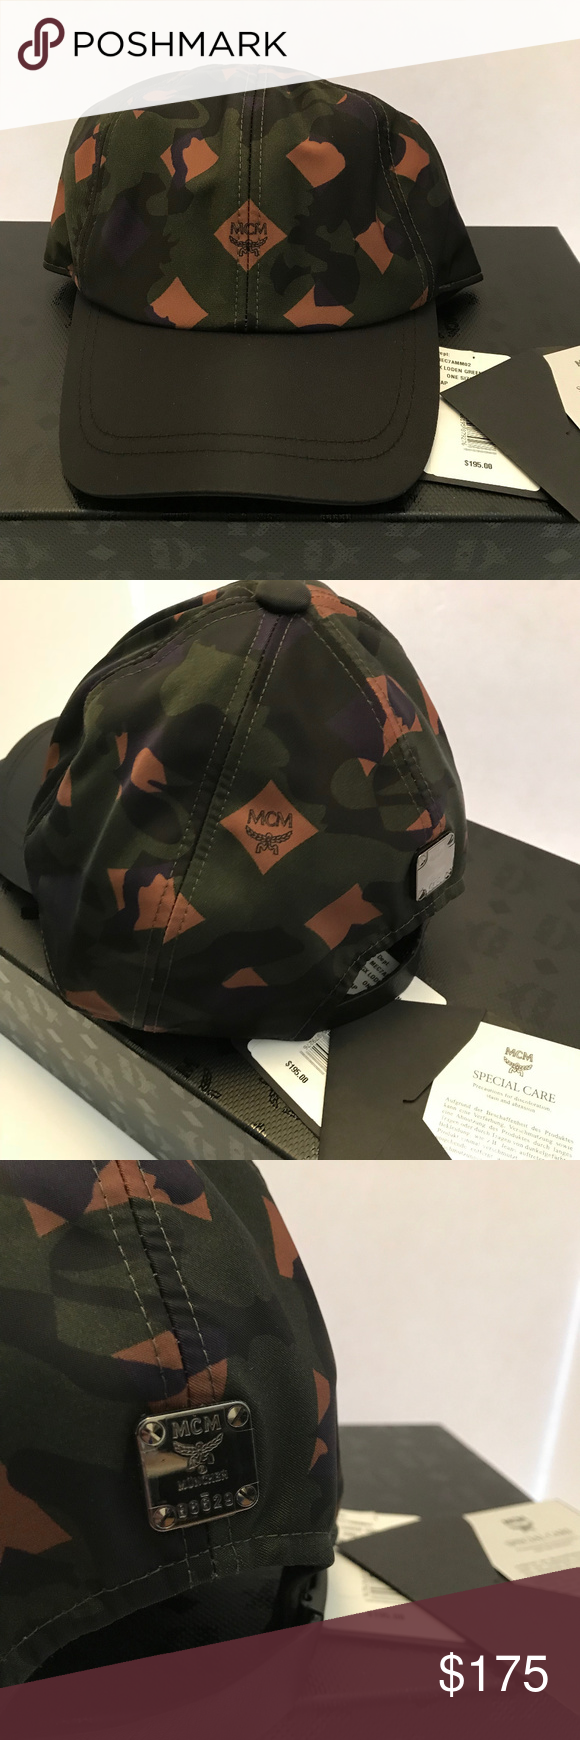 96f77234df575 Mcm dieter lion camo baseball cap